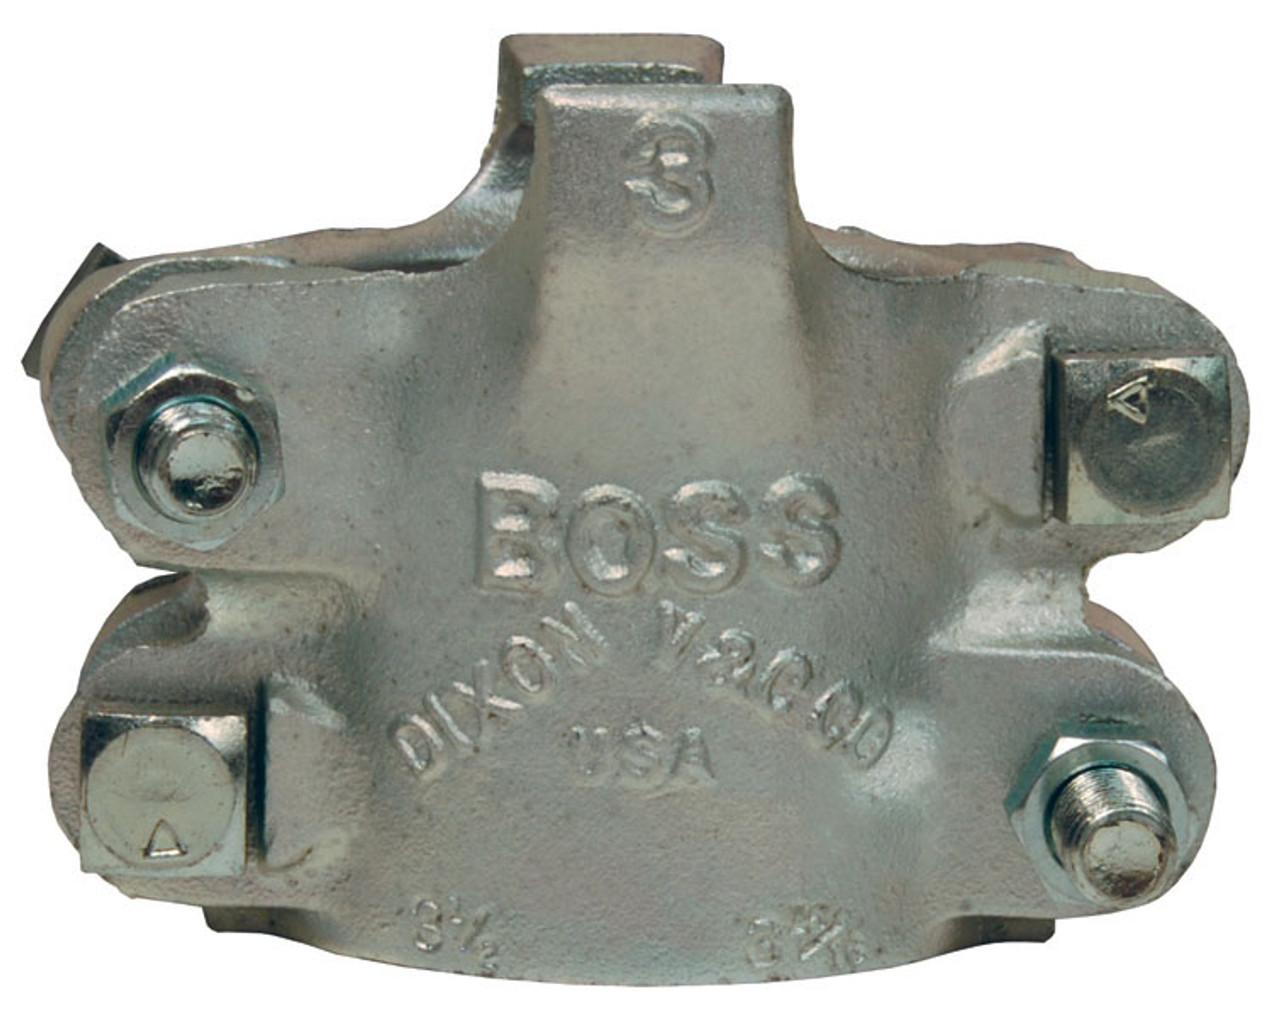 Dixon Boss Cl&s Zinc Plated Iron 4-Bolt Type 2 Gripping Fingers - John M. Ellsworth Co. Inc.  sc 1 st  John M. Ellsworth & Dixon Boss Clamps Zinc Plated Iron 4-Bolt Type 2 Gripping Fingers ...